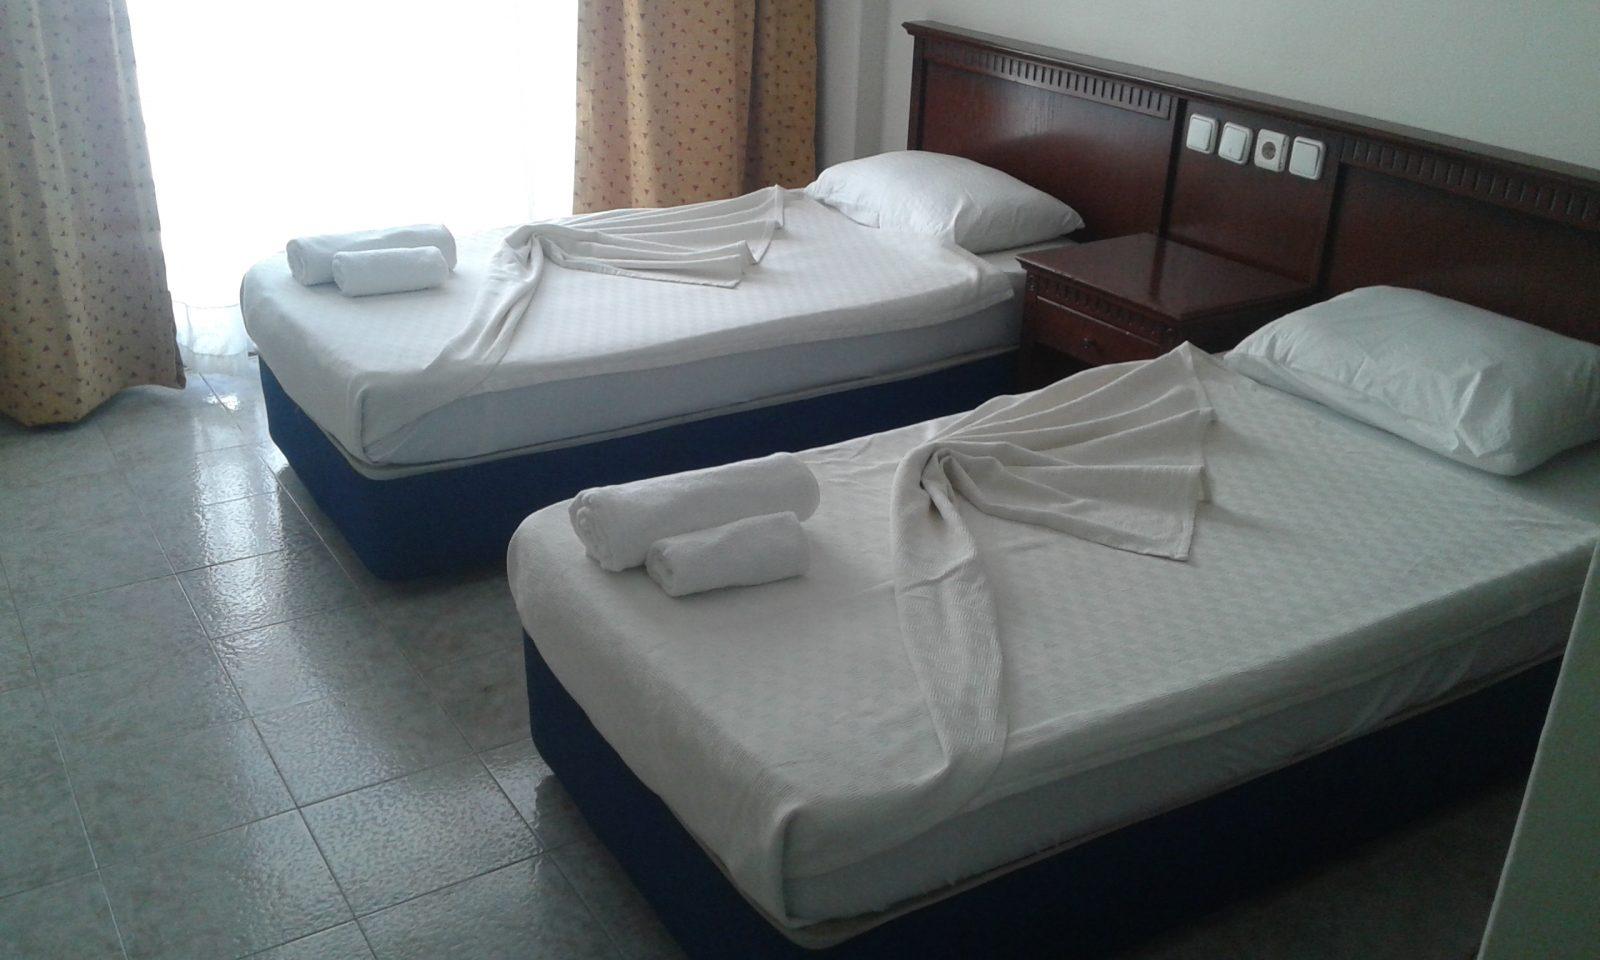 Letovanje Turska autobusom, Kusadasi, Hotel Tecimen,izgled dvokrevetne sobe